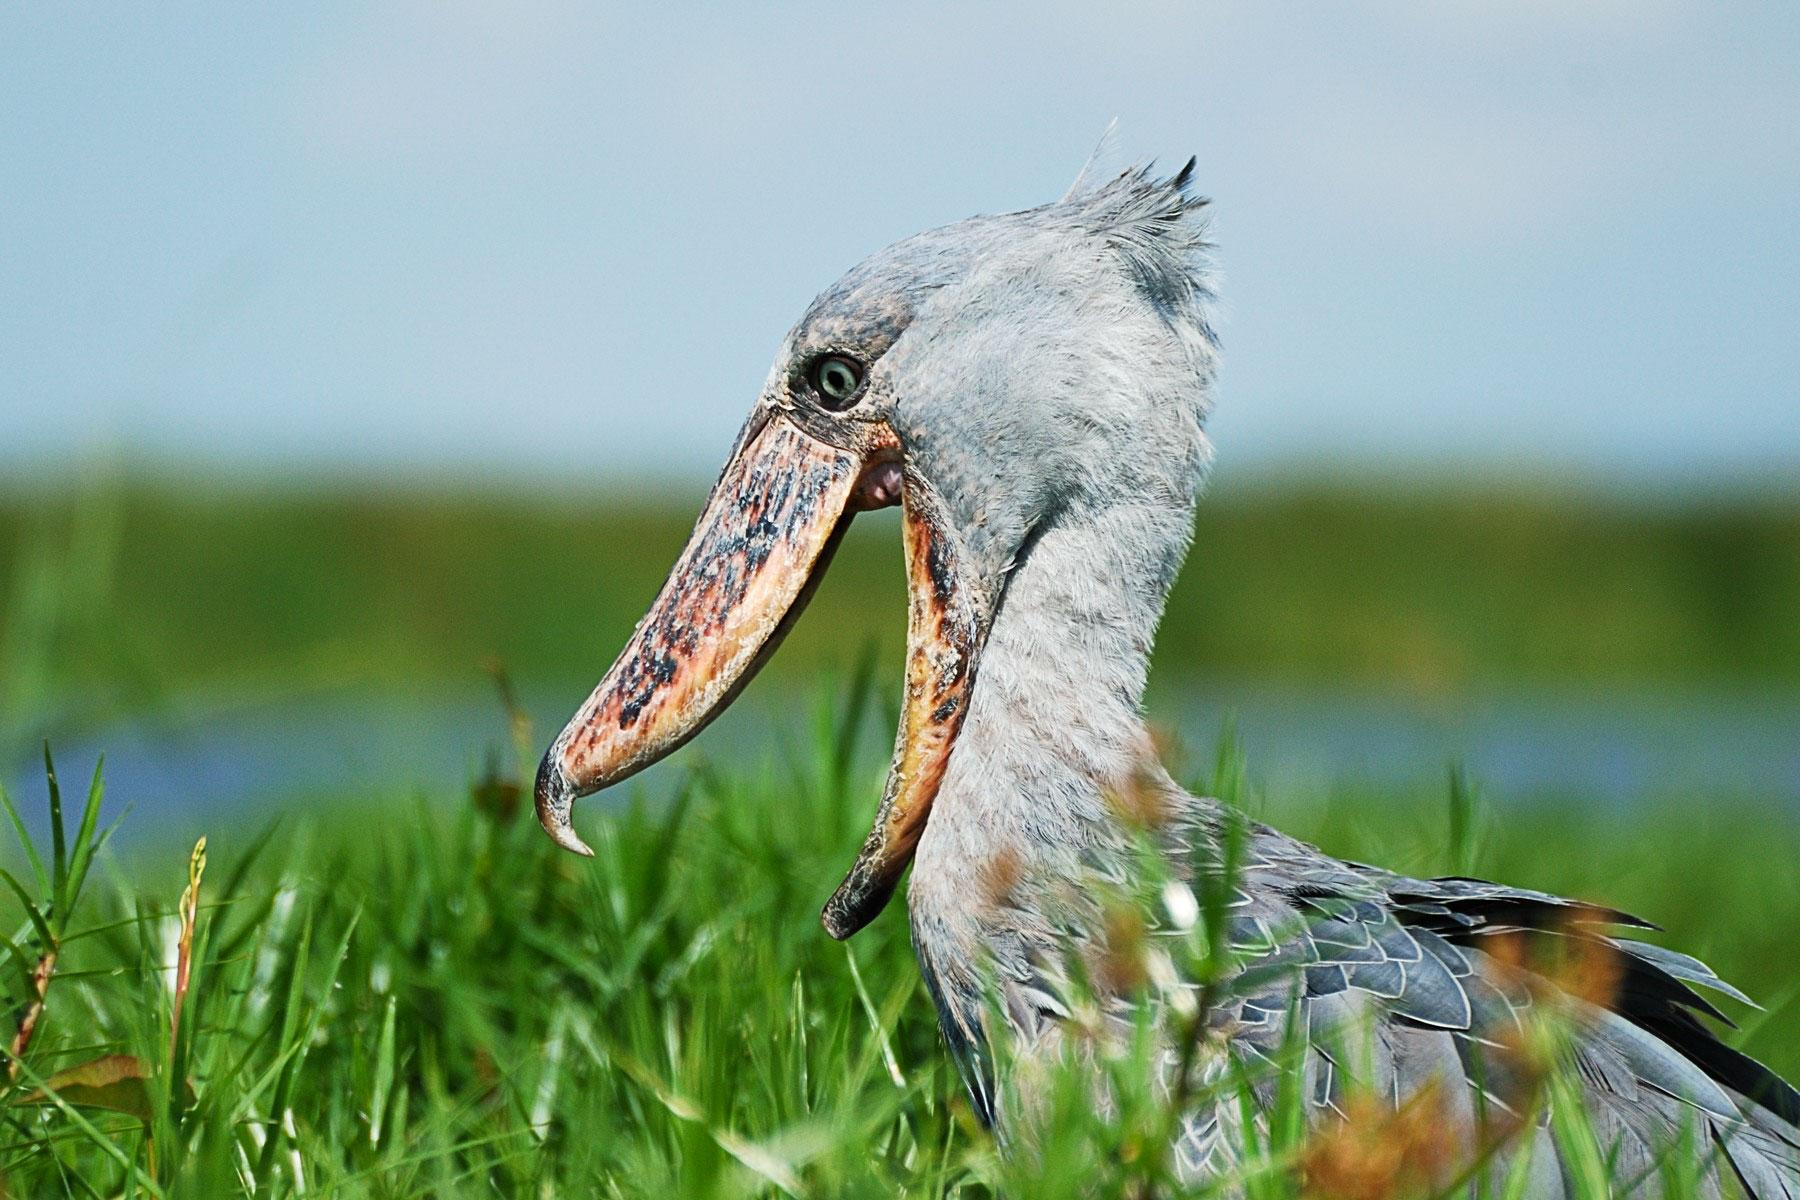 Shoebill. John Rollins/Audubon Photography Awards